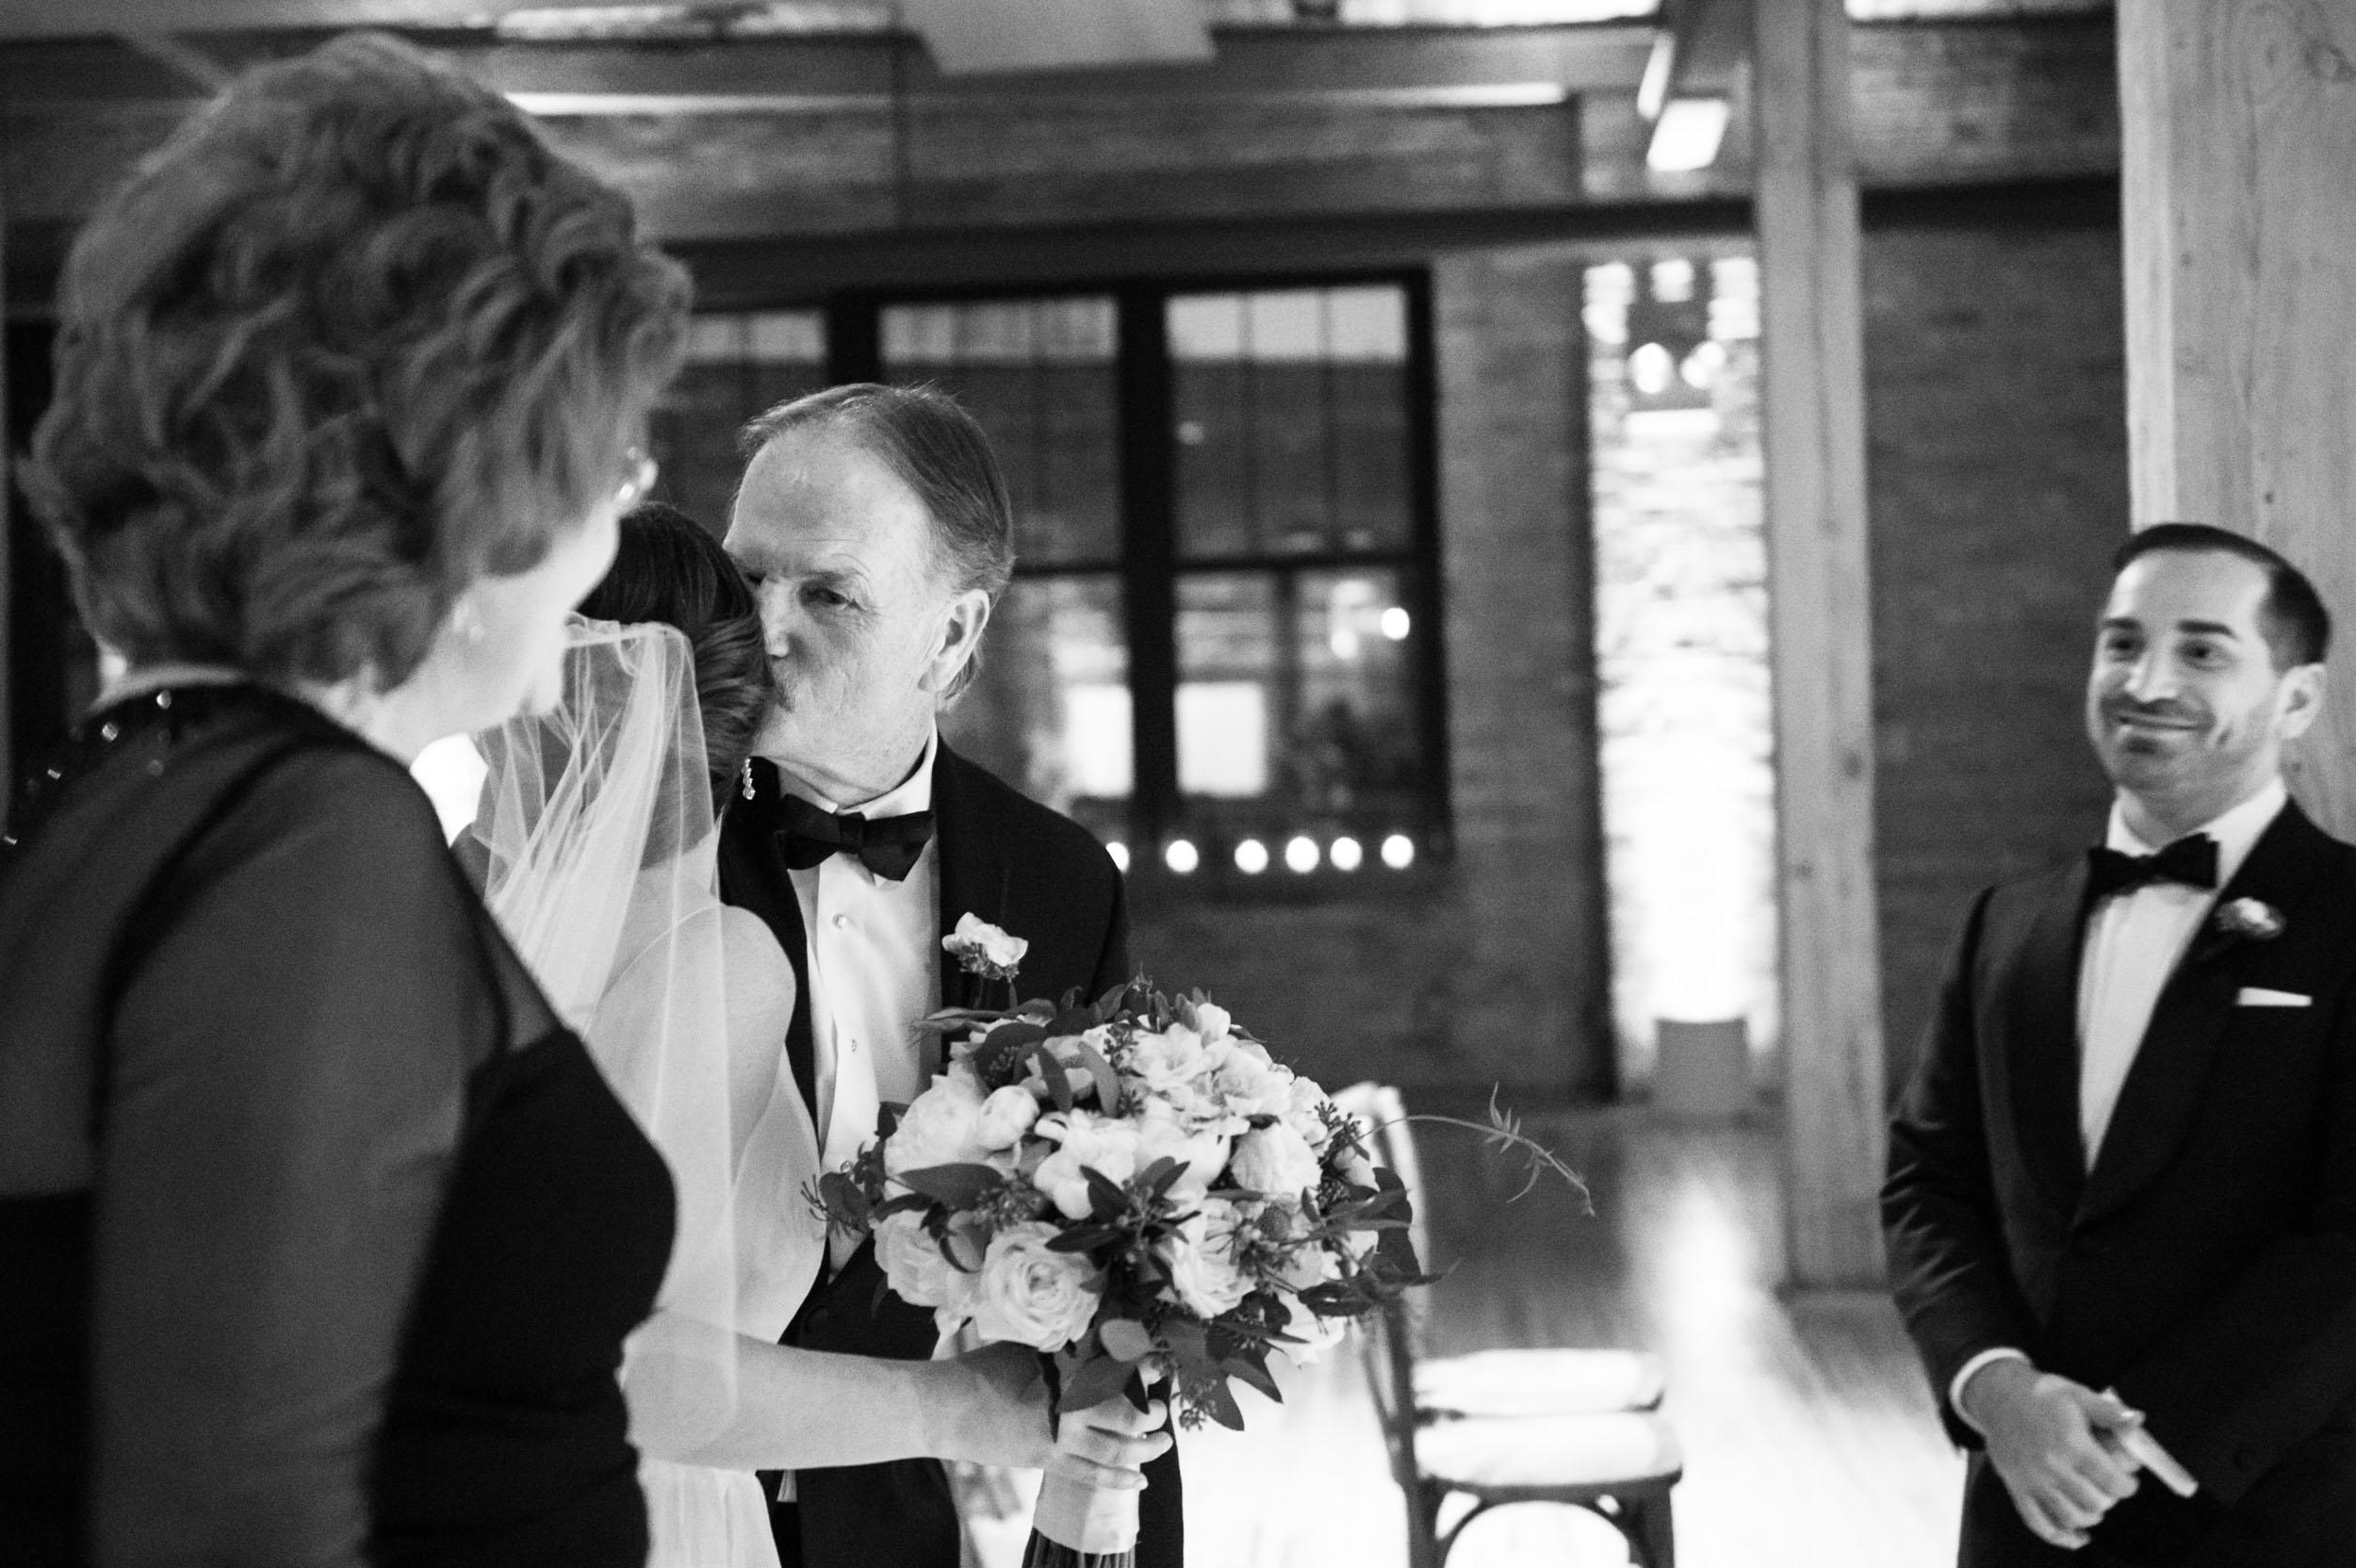 Wedding ceremony at Bridgeport Art Center